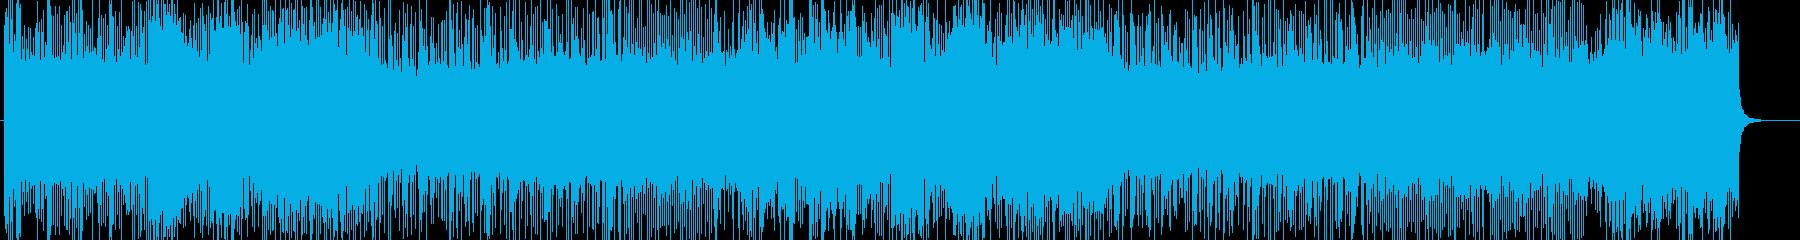 「HR/HM」「DARK」BGM148の再生済みの波形